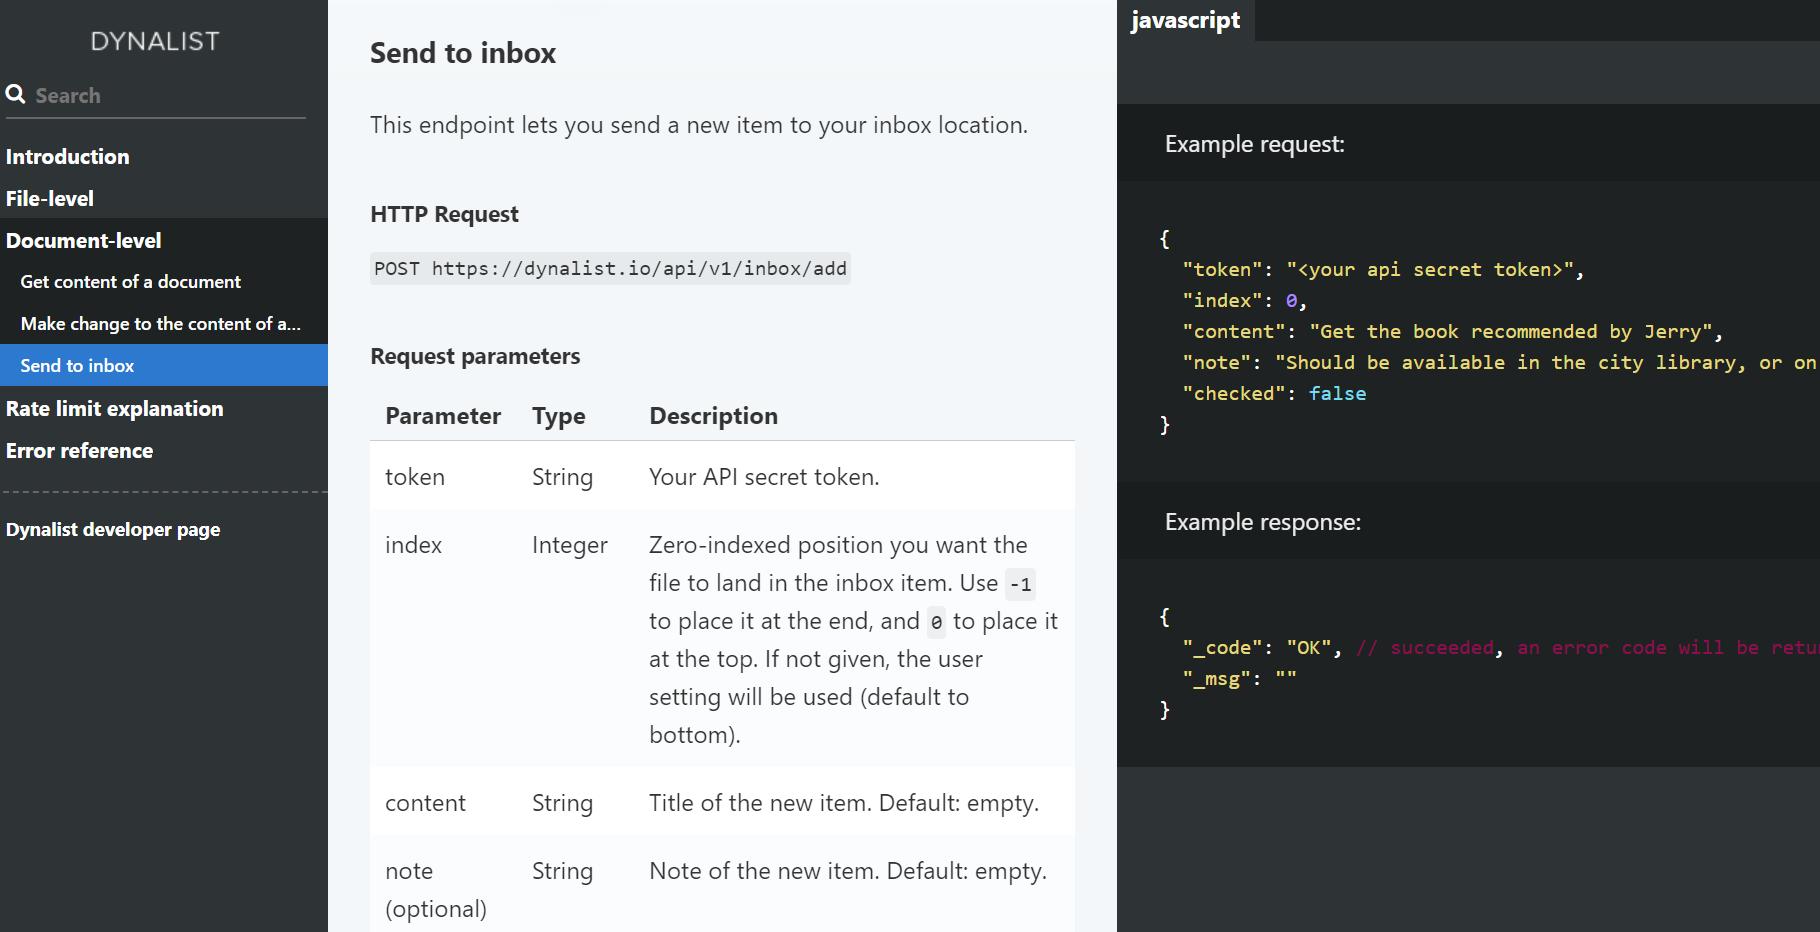 Quick add to Dynalist inbox using AutoHotKey - 🌈Share